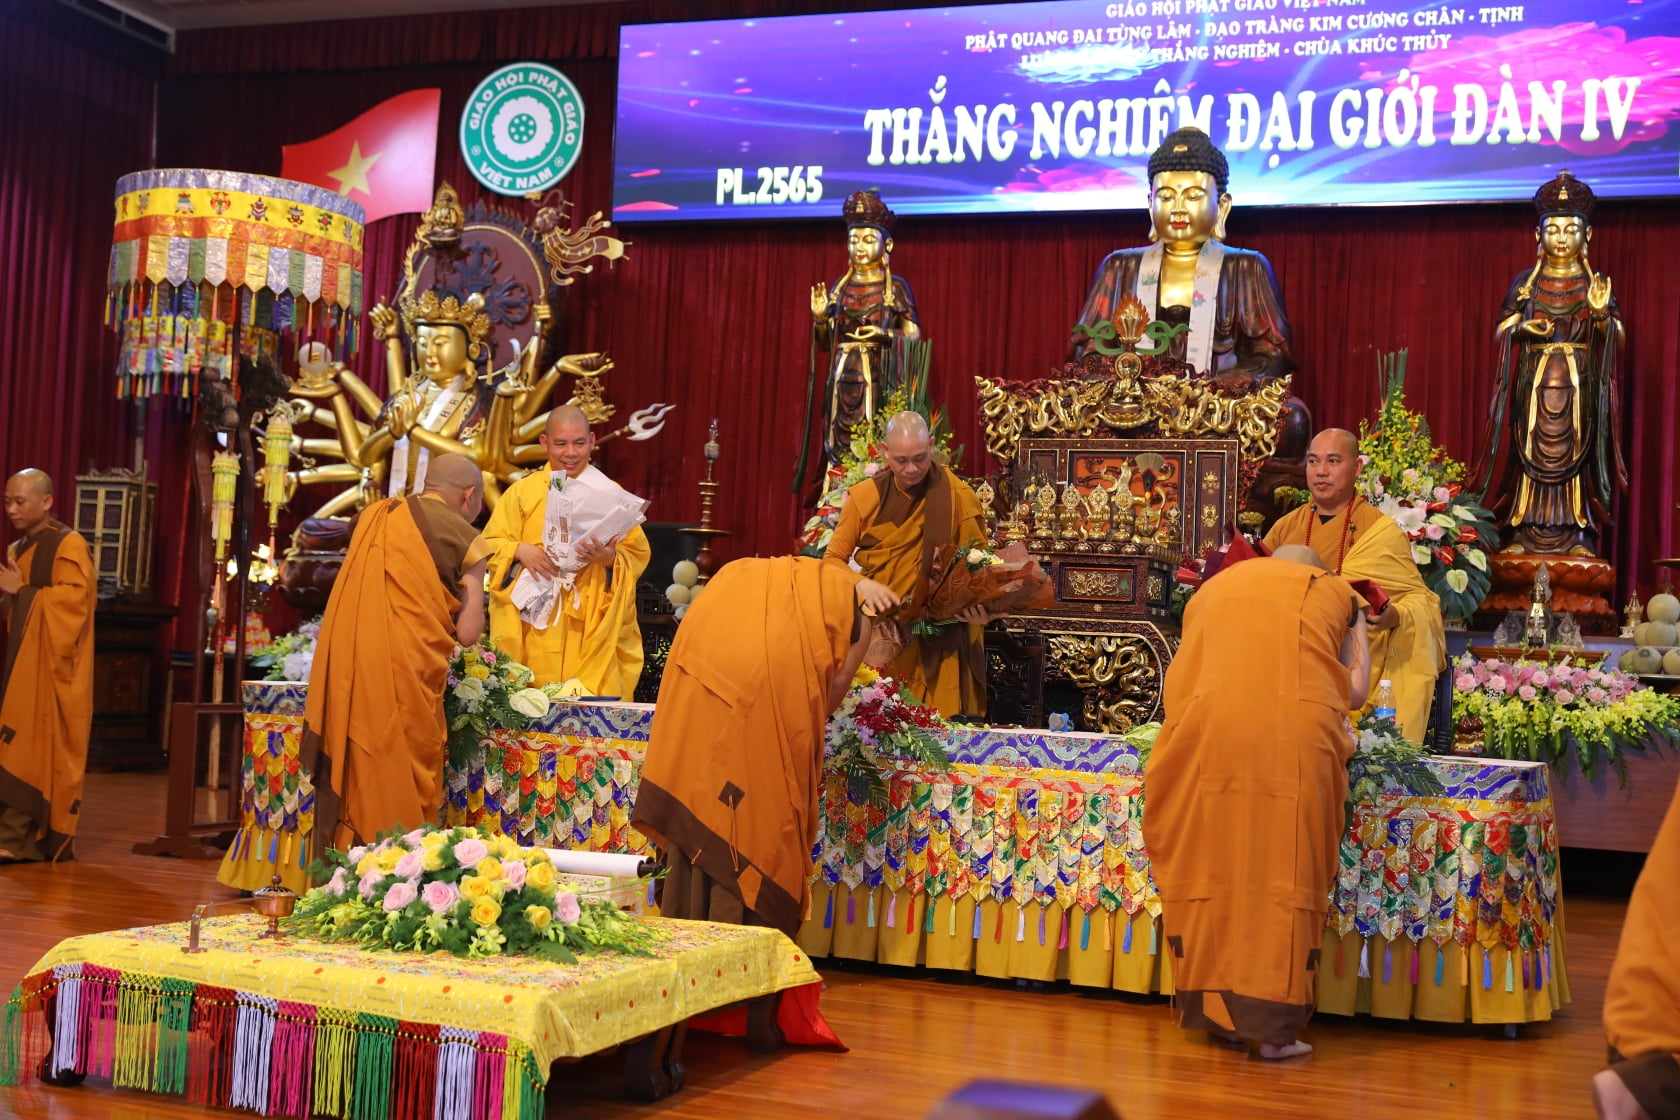 Thang Nghiem Dai Gioi Dan IV (125)